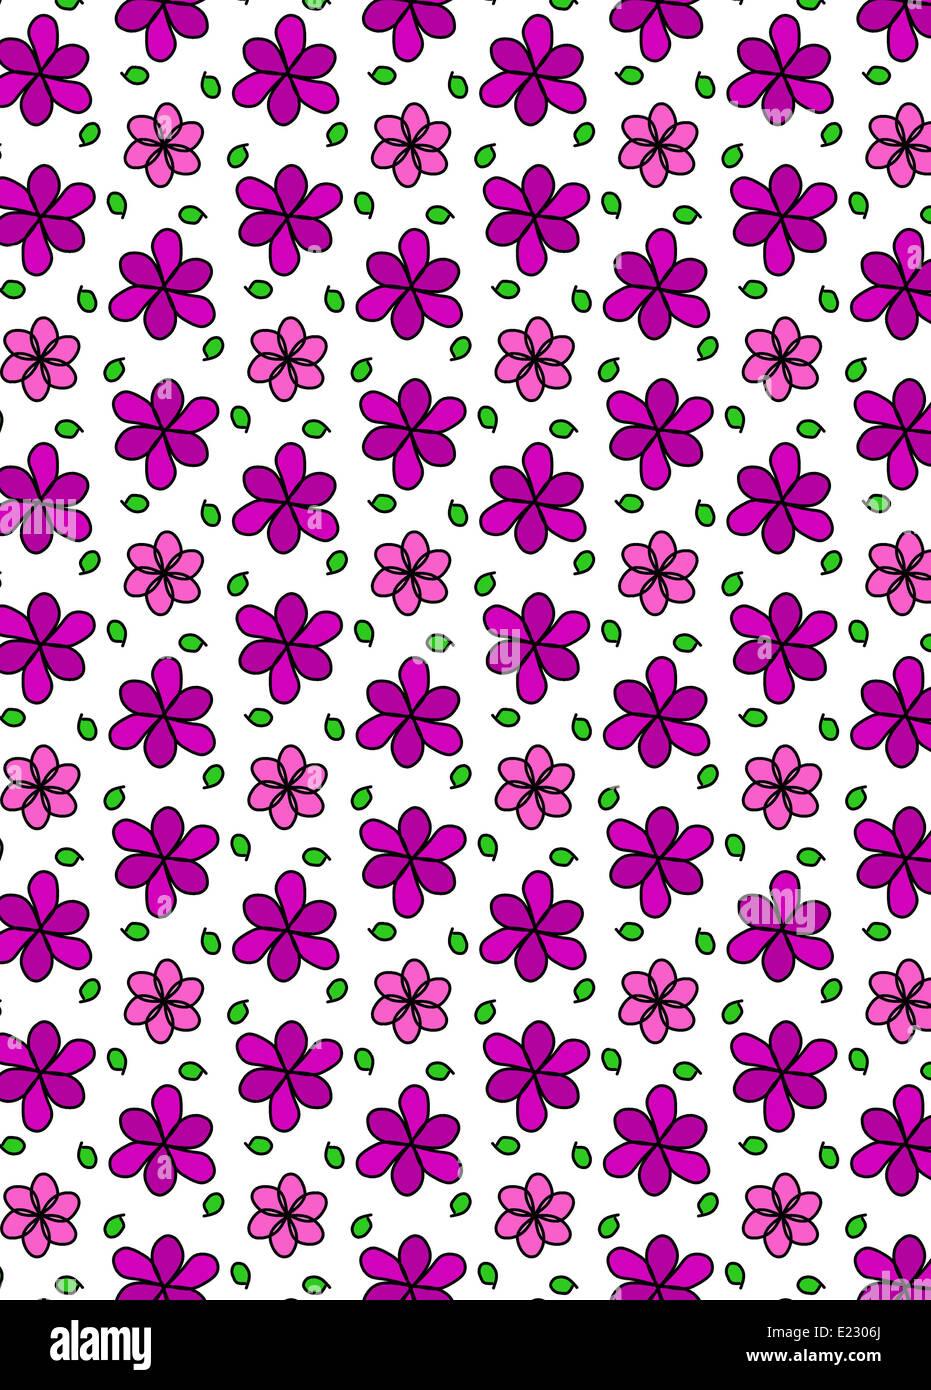 Illustration of symmetrical patterned flowered wallpaper stock photo illustration of symmetrical patterned flowered wallpaper mightylinksfo